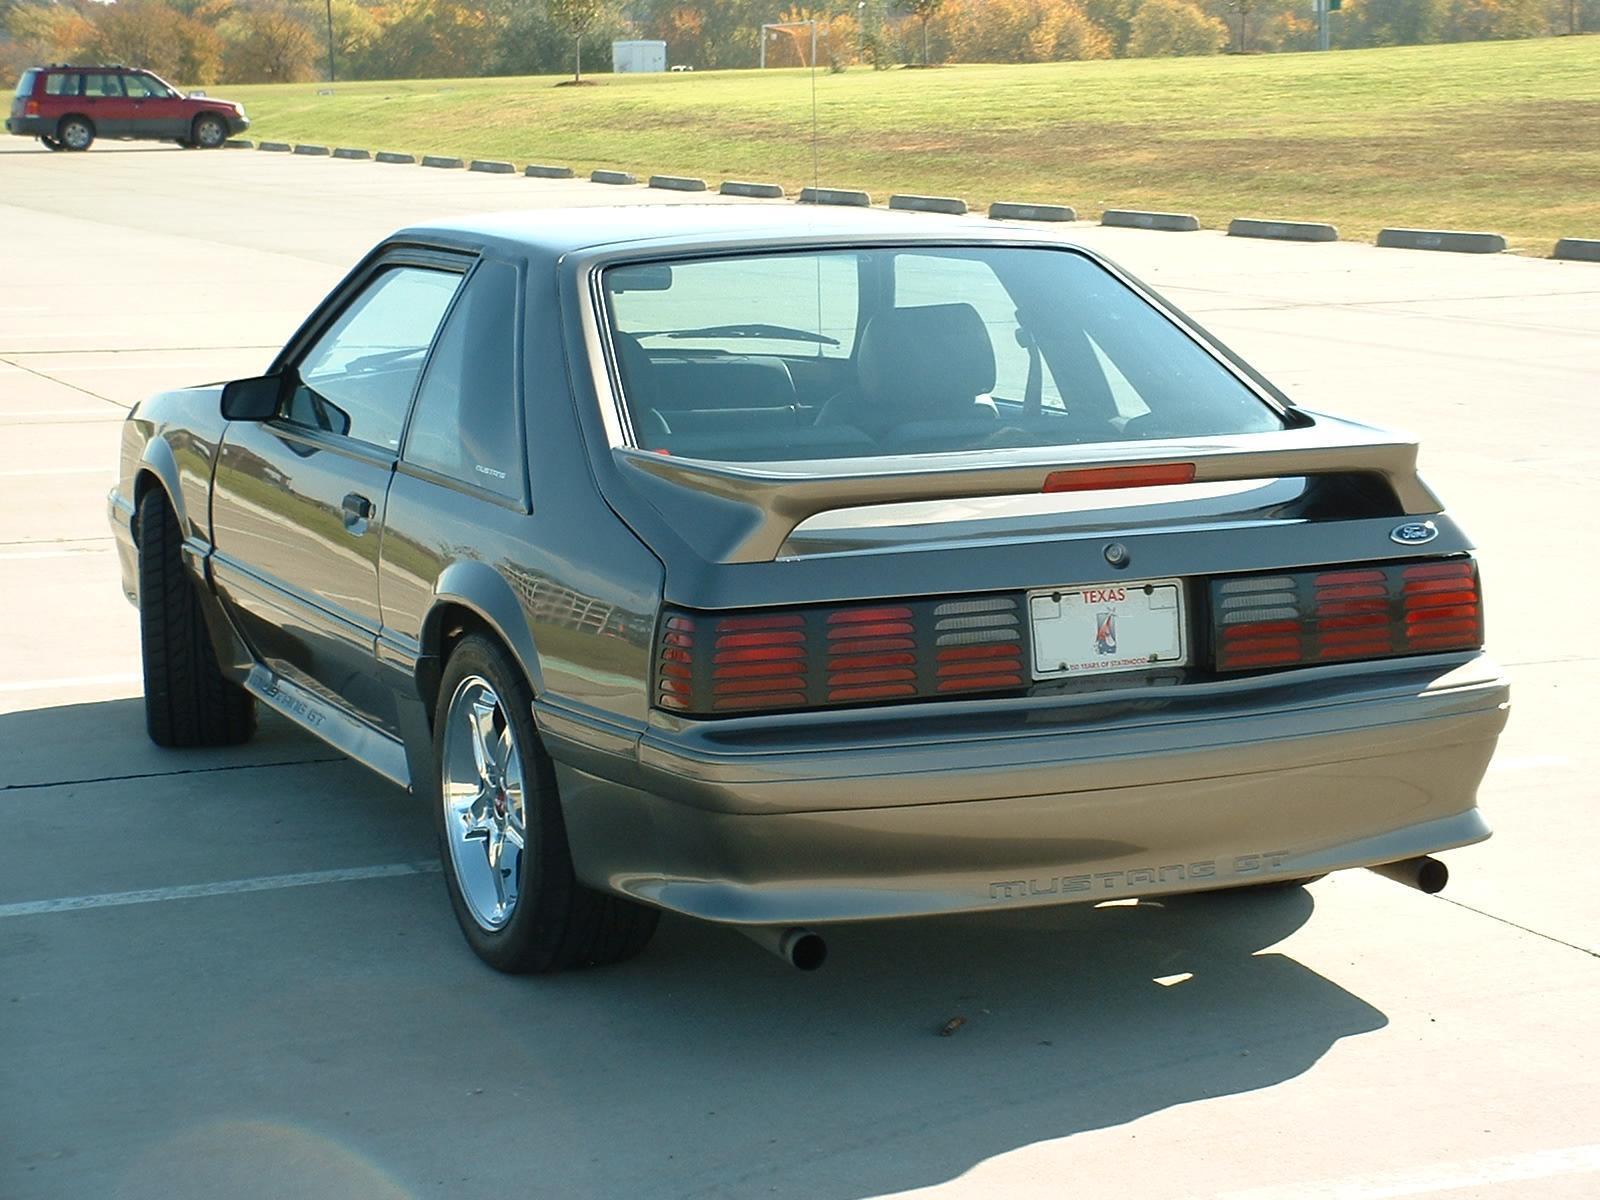 1989 Mustang Gt Convertible Value